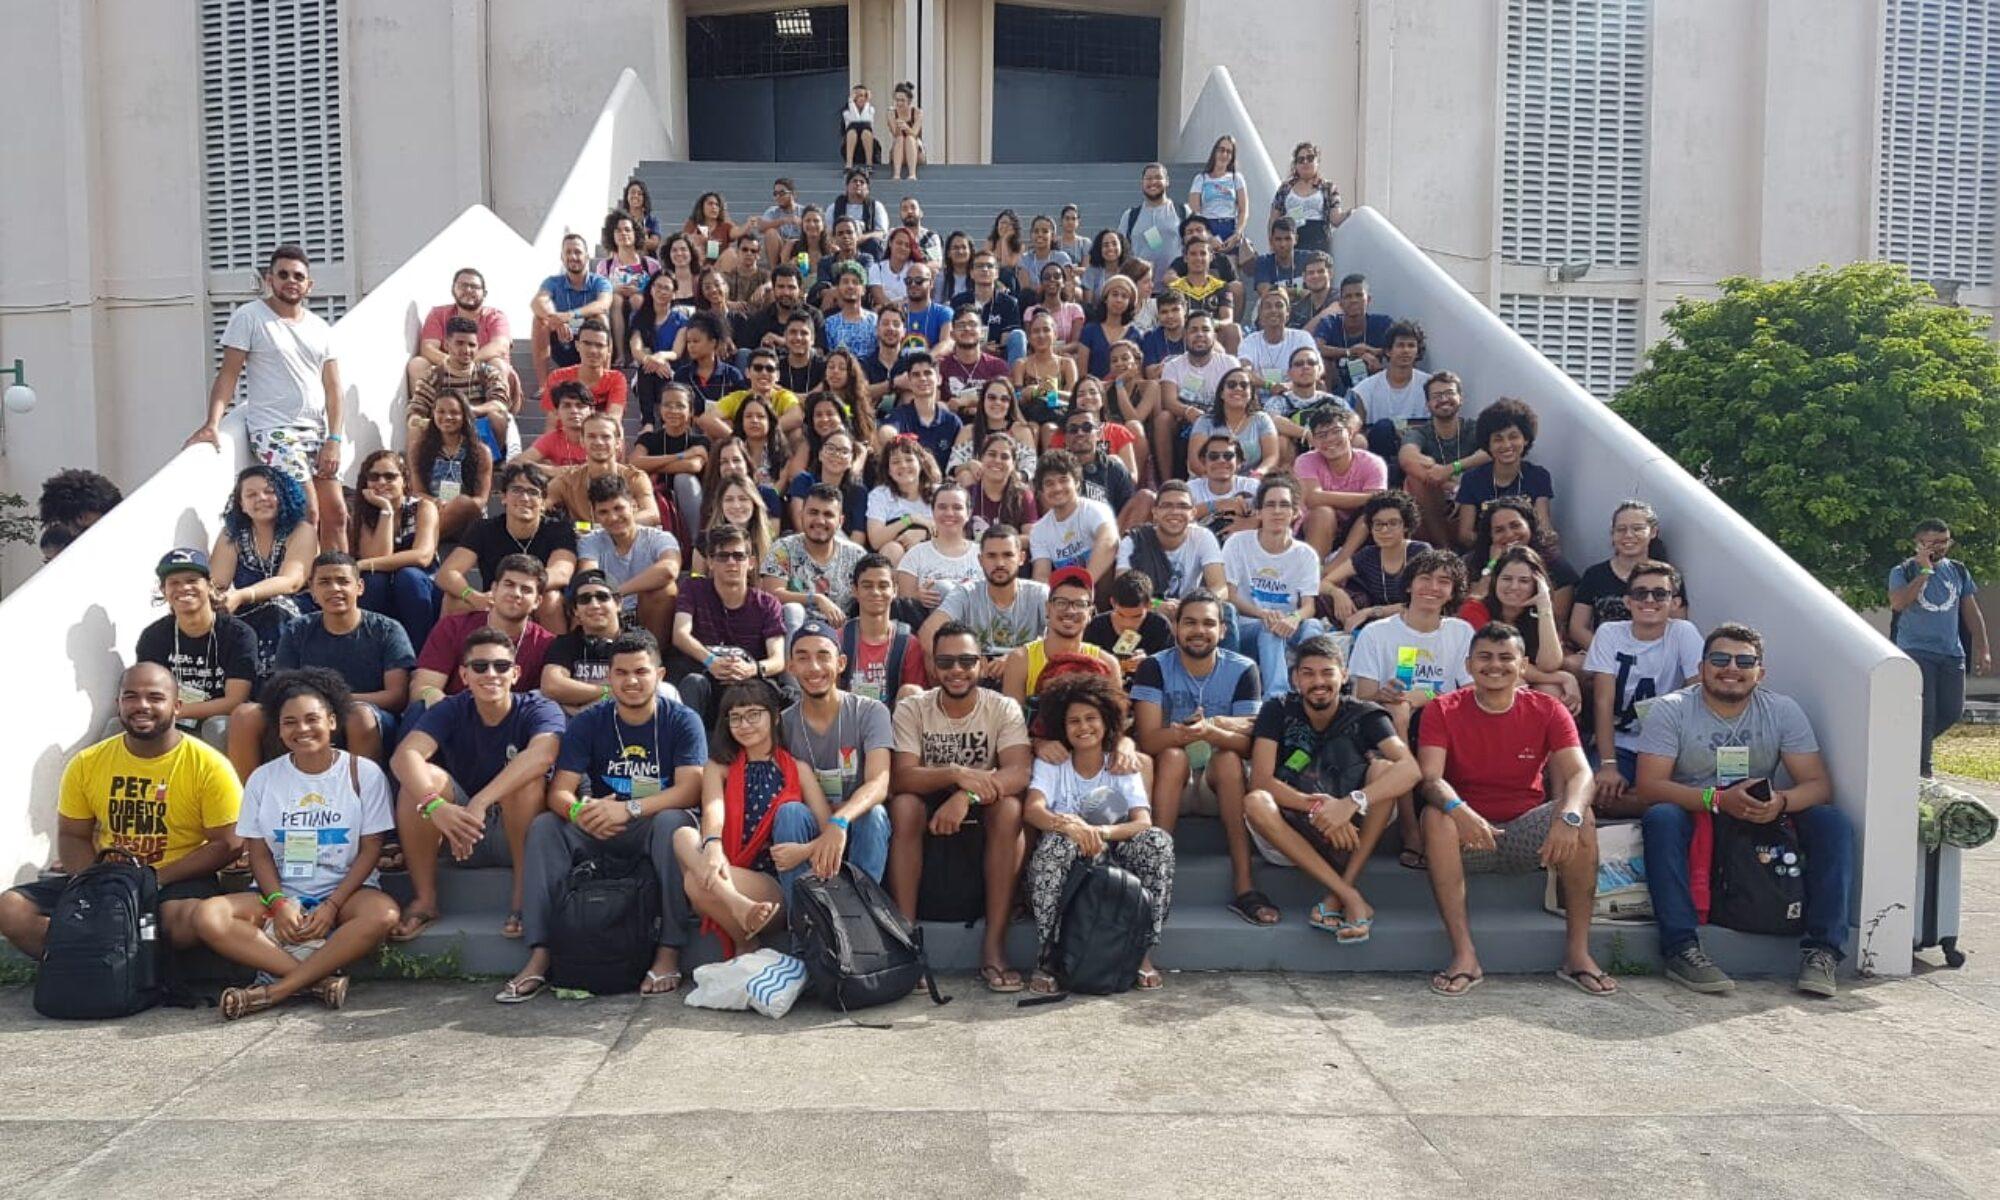 Movimento InterPET Ceará